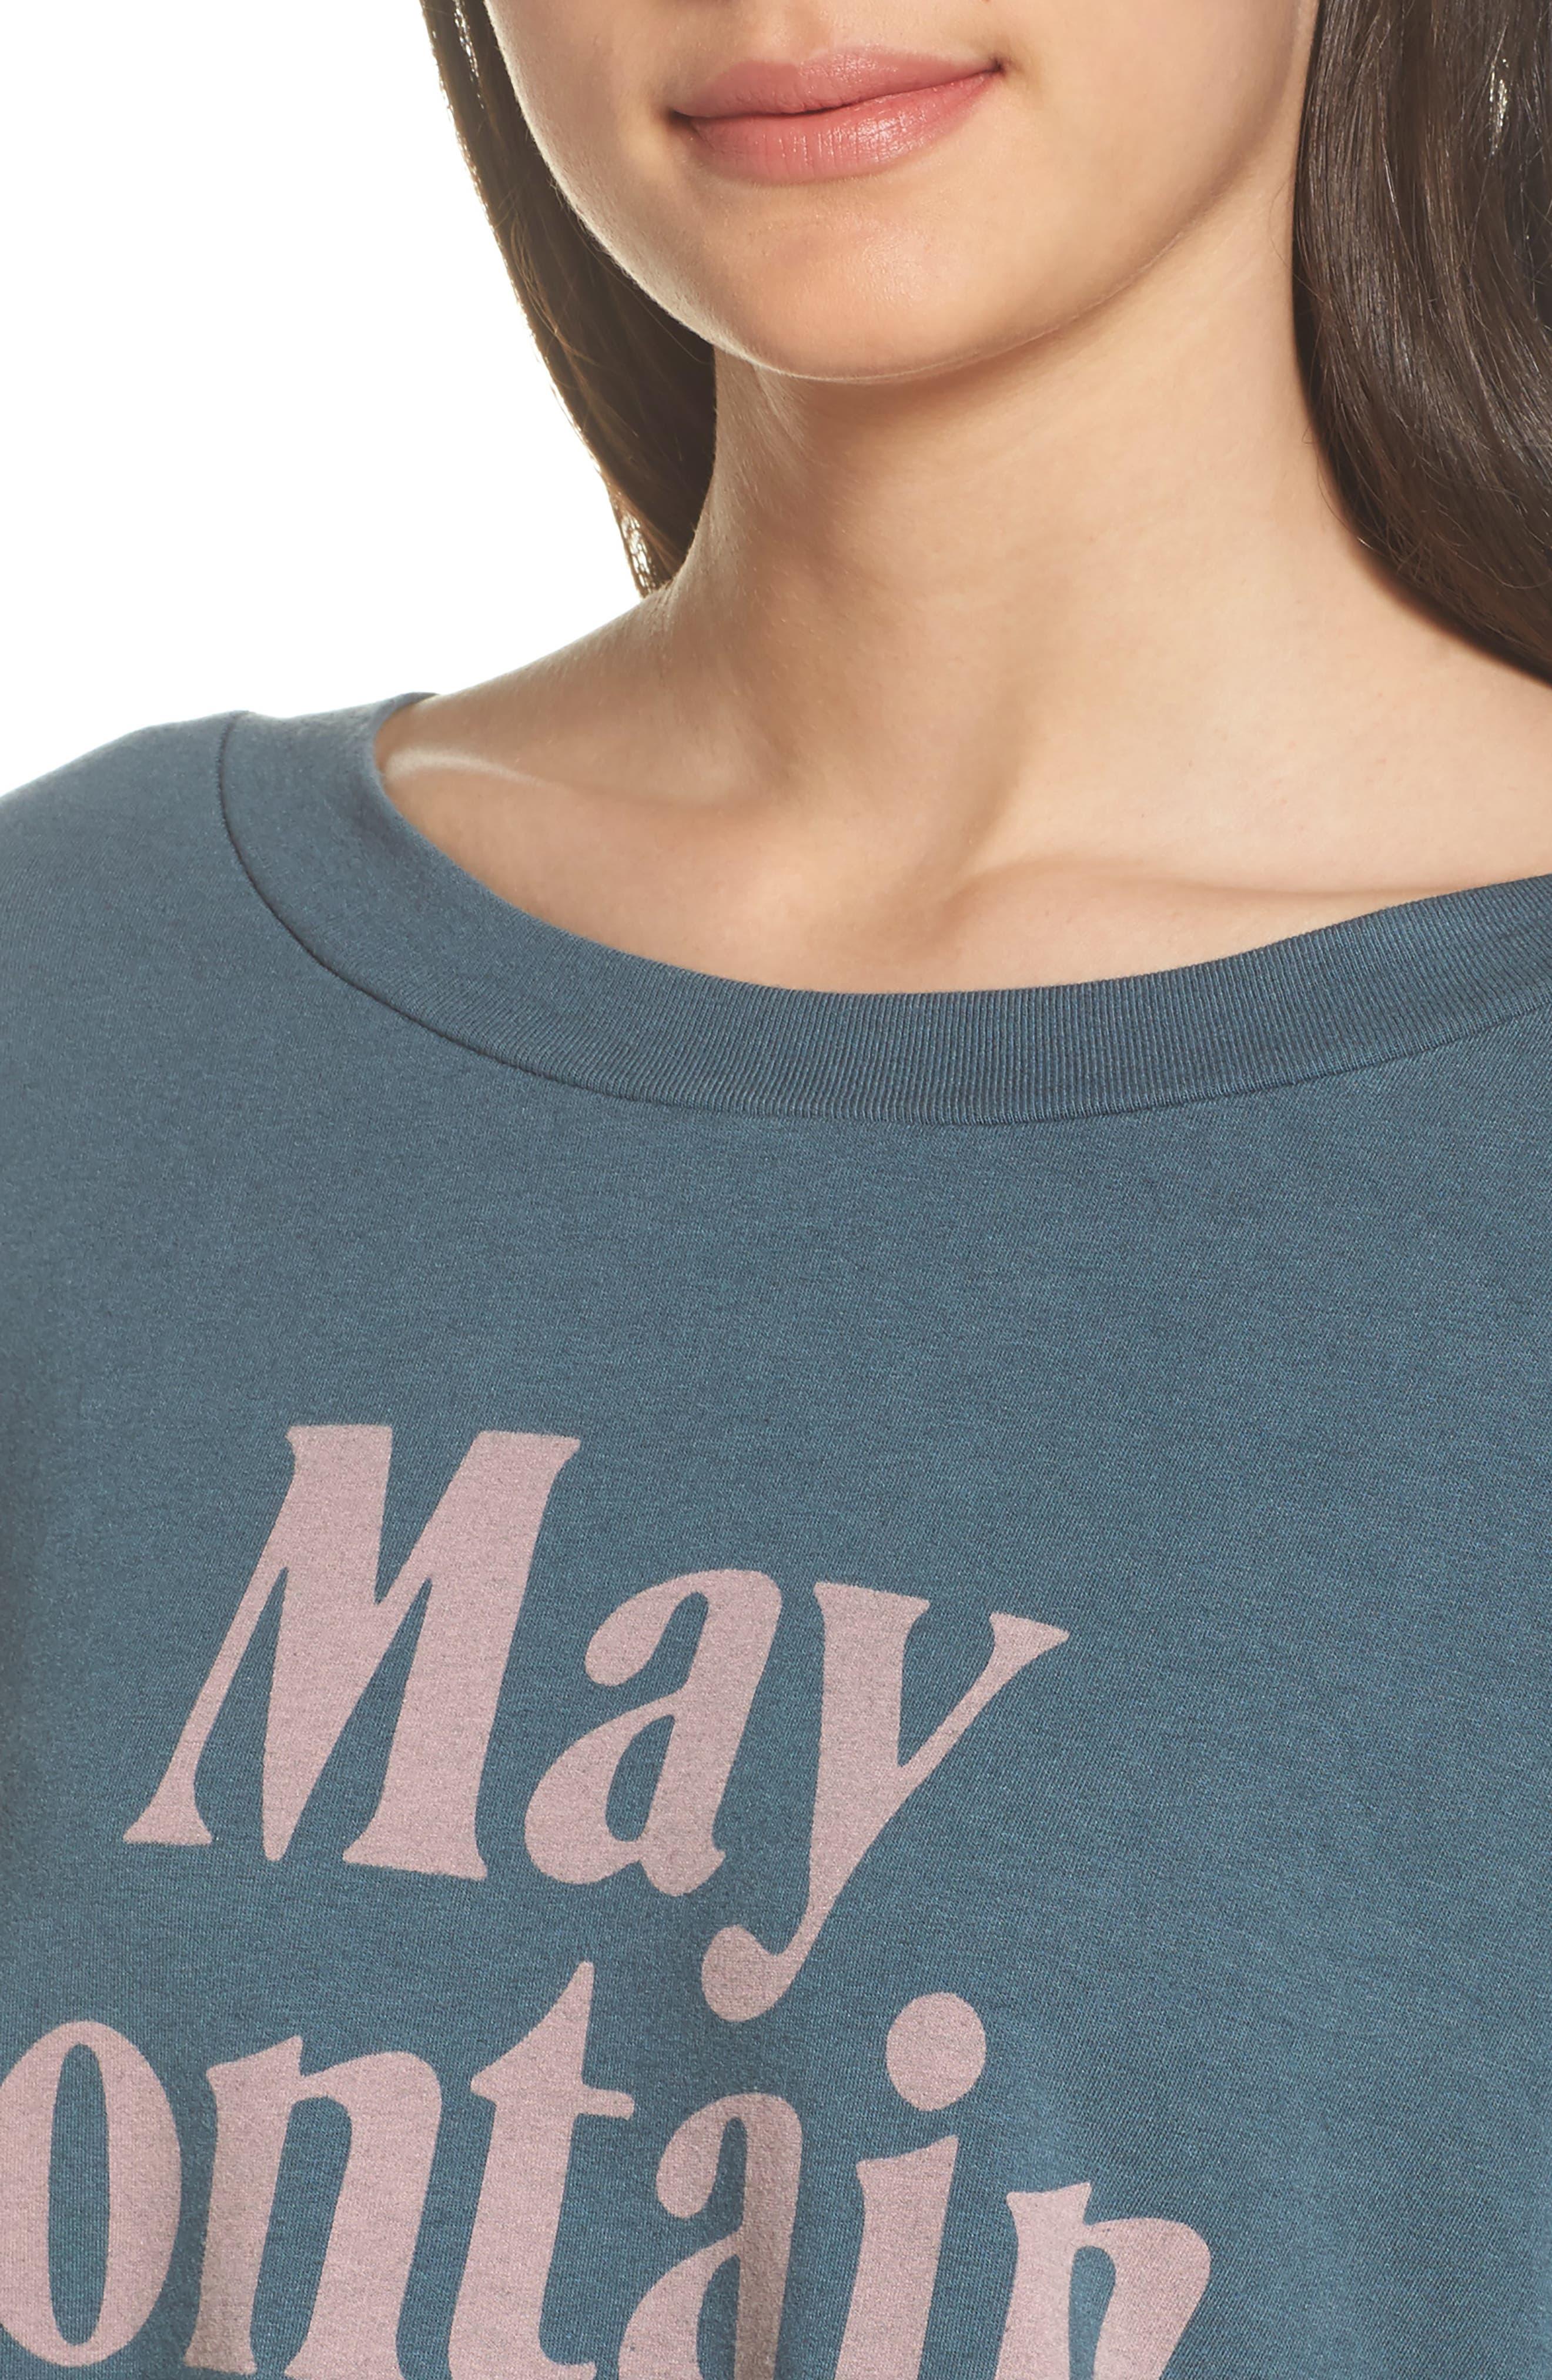 May Contain Wine Sweatshirt,                             Alternate thumbnail 5, color,                             Gunmetal